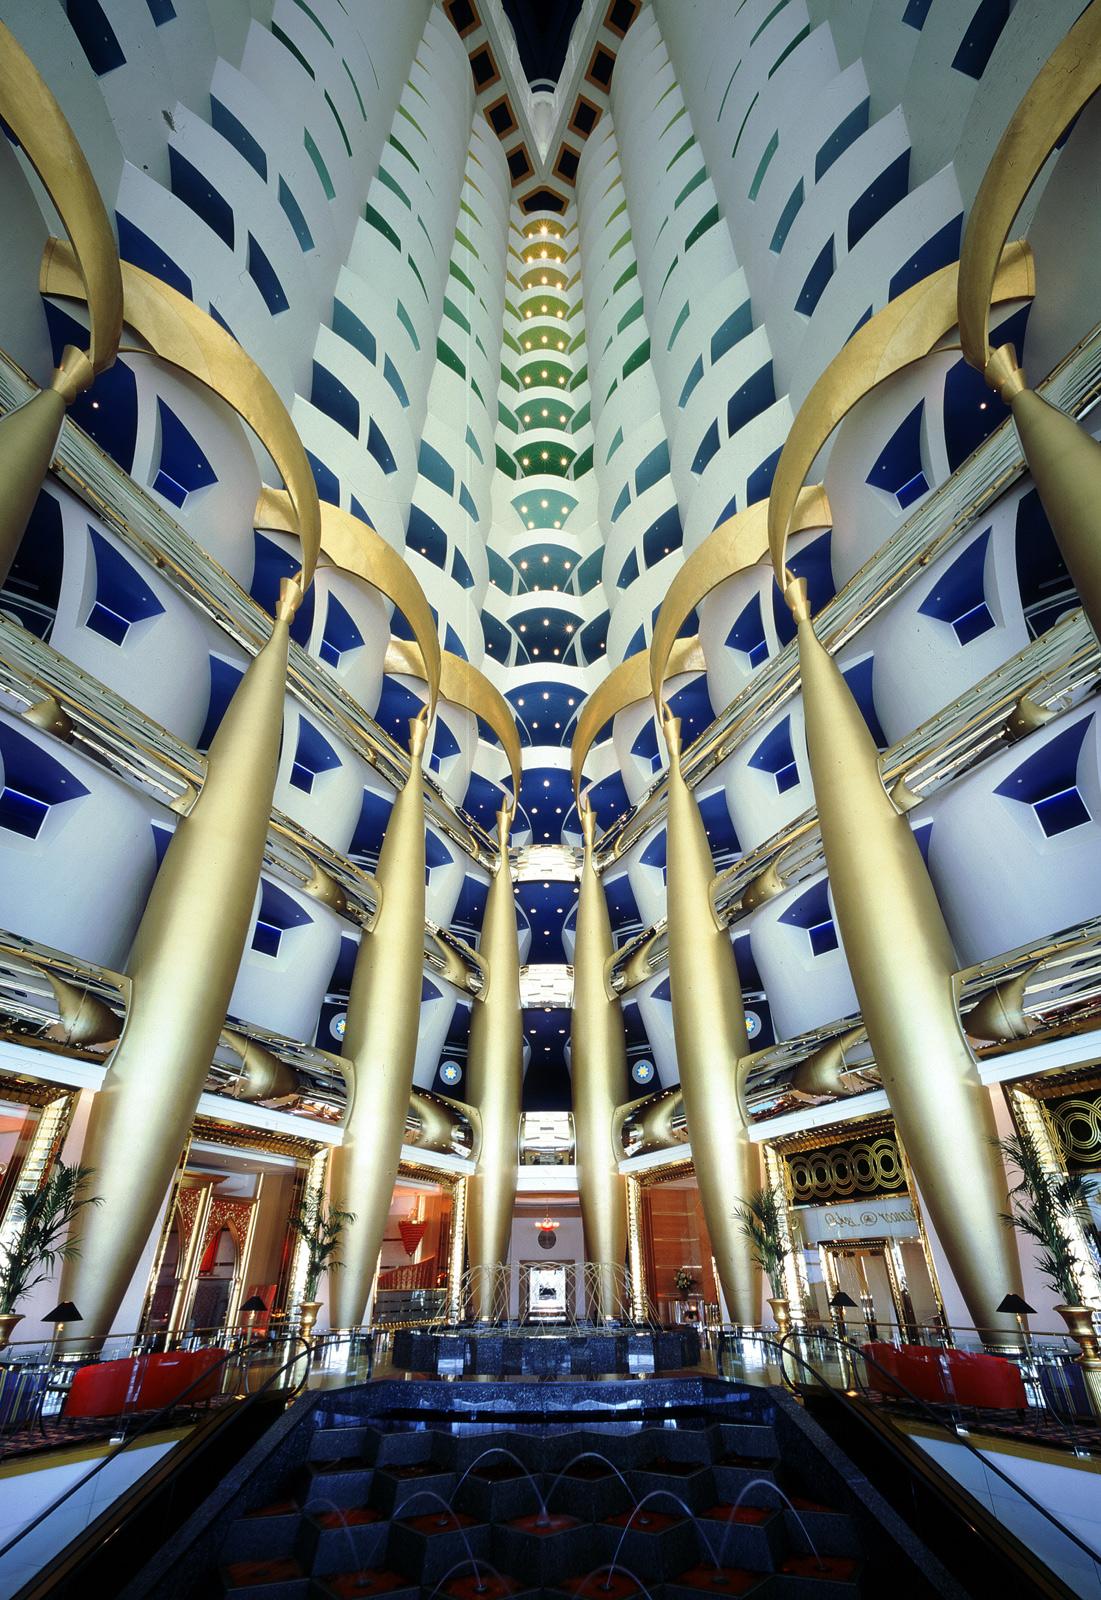 burj-al-arab-interior-2.jpg